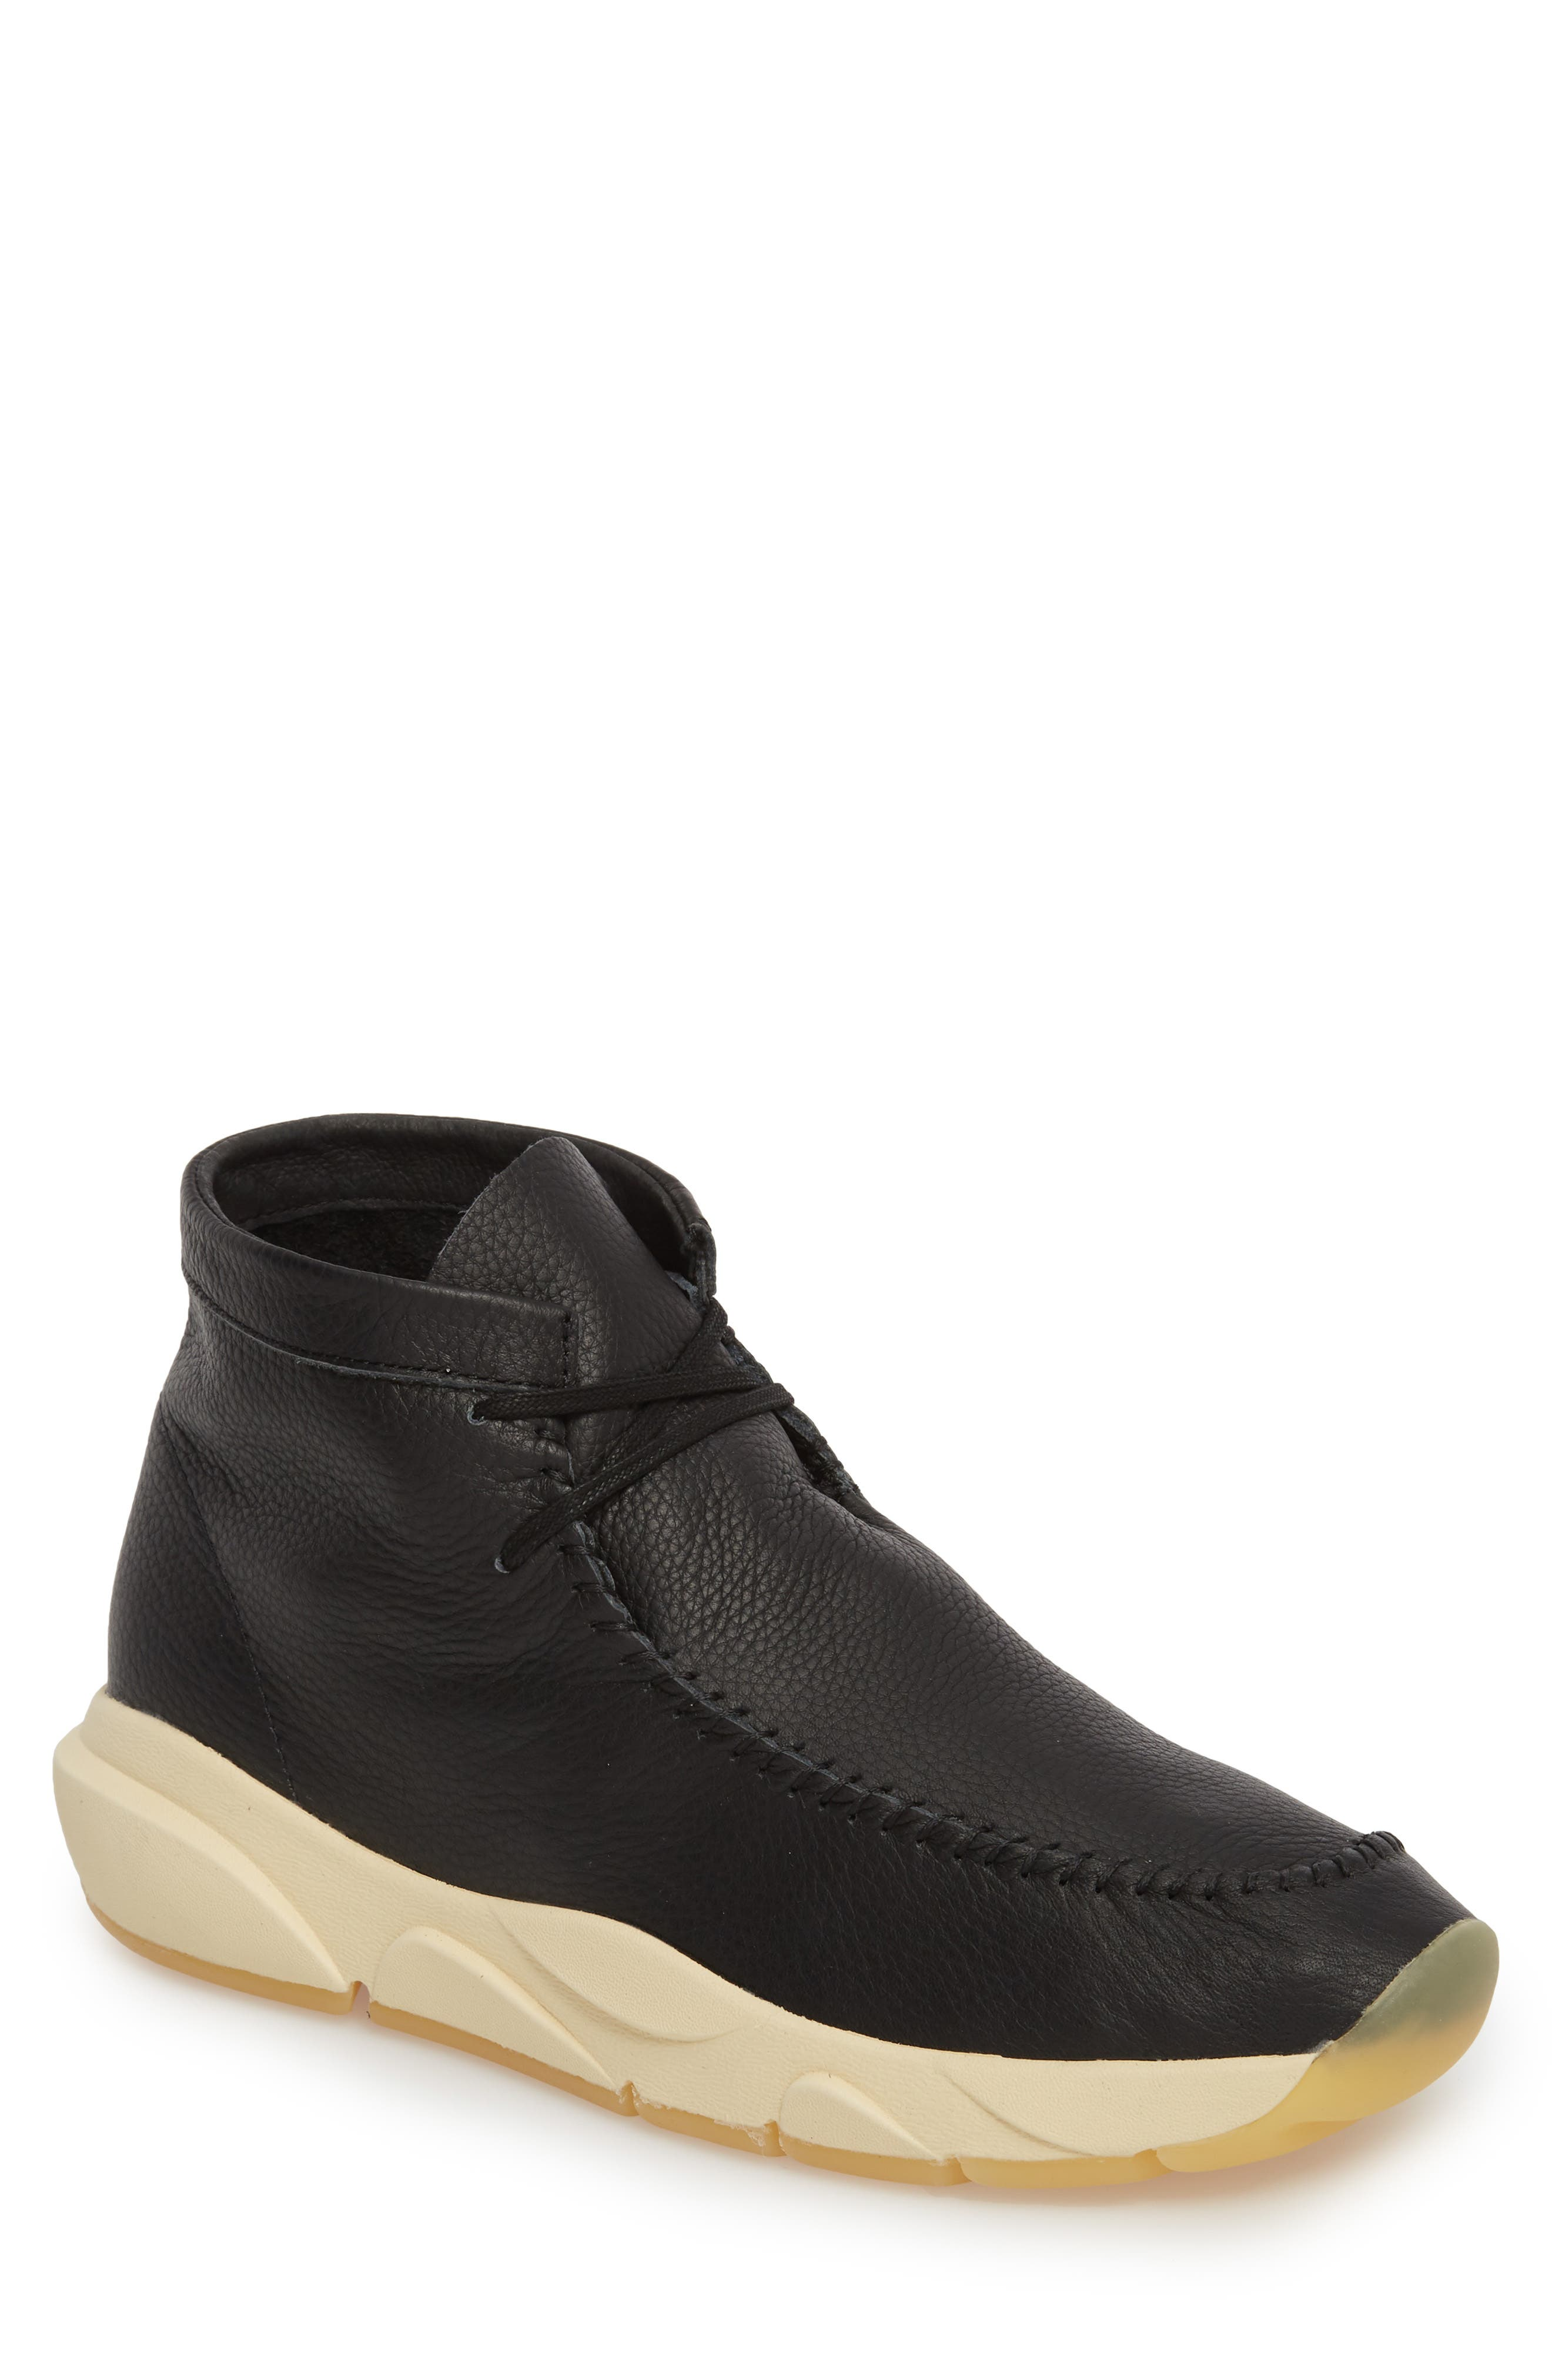 Alternate Image 1 Selected - Clearweather Castas Asymmetrical Chukka Sneaker (Men)